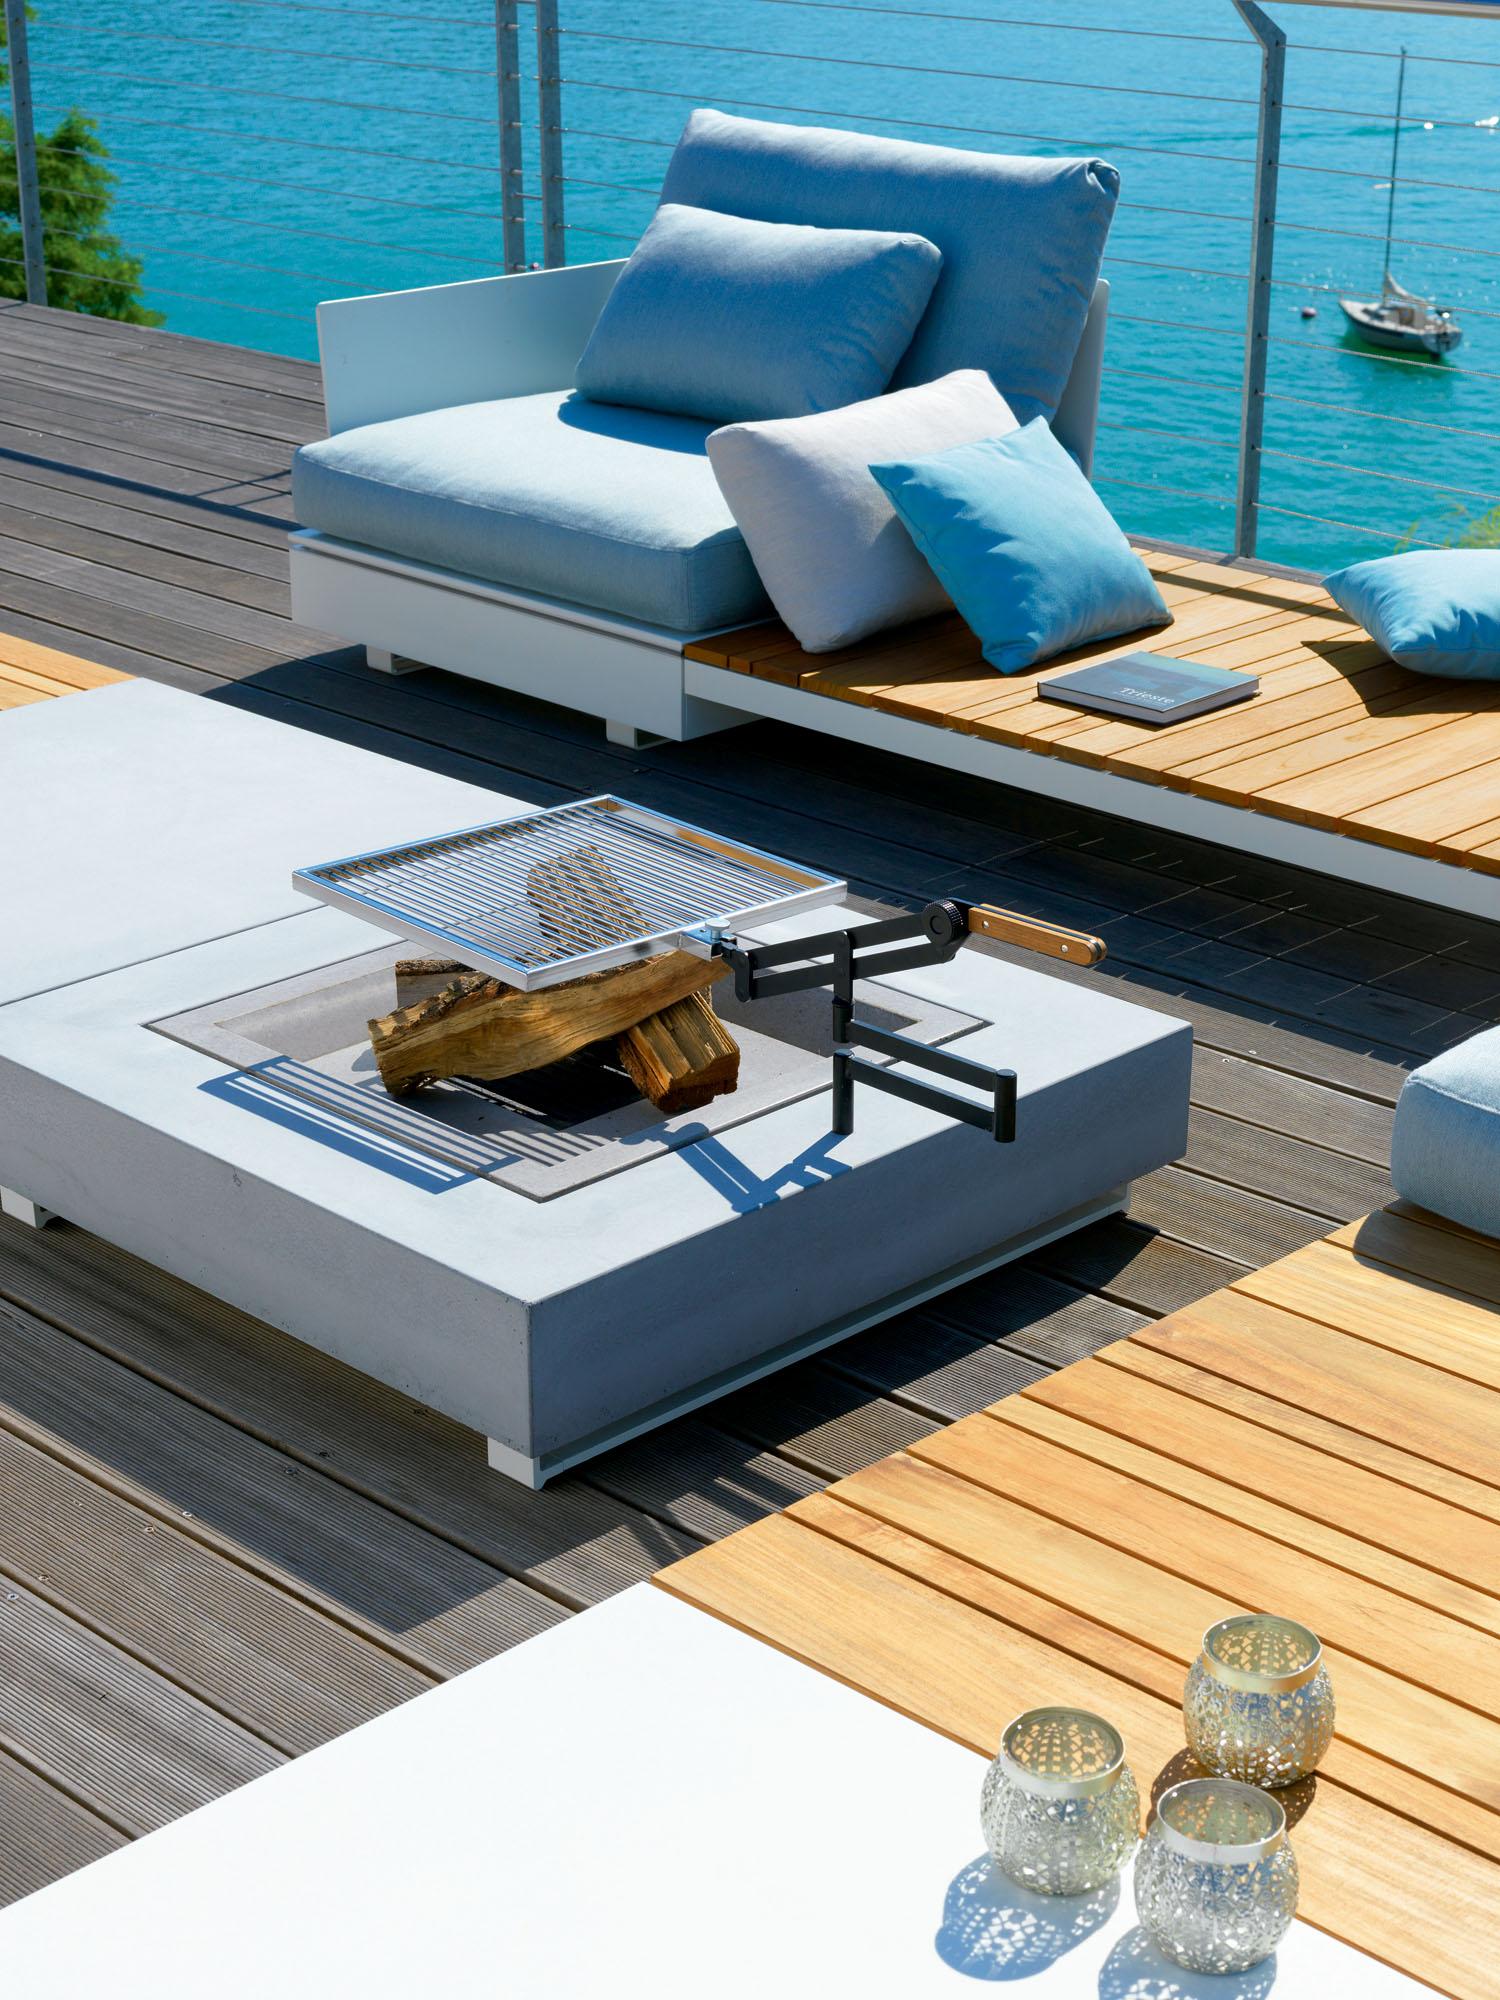 jardines urbanos muebles de dise o para exterior. Black Bedroom Furniture Sets. Home Design Ideas